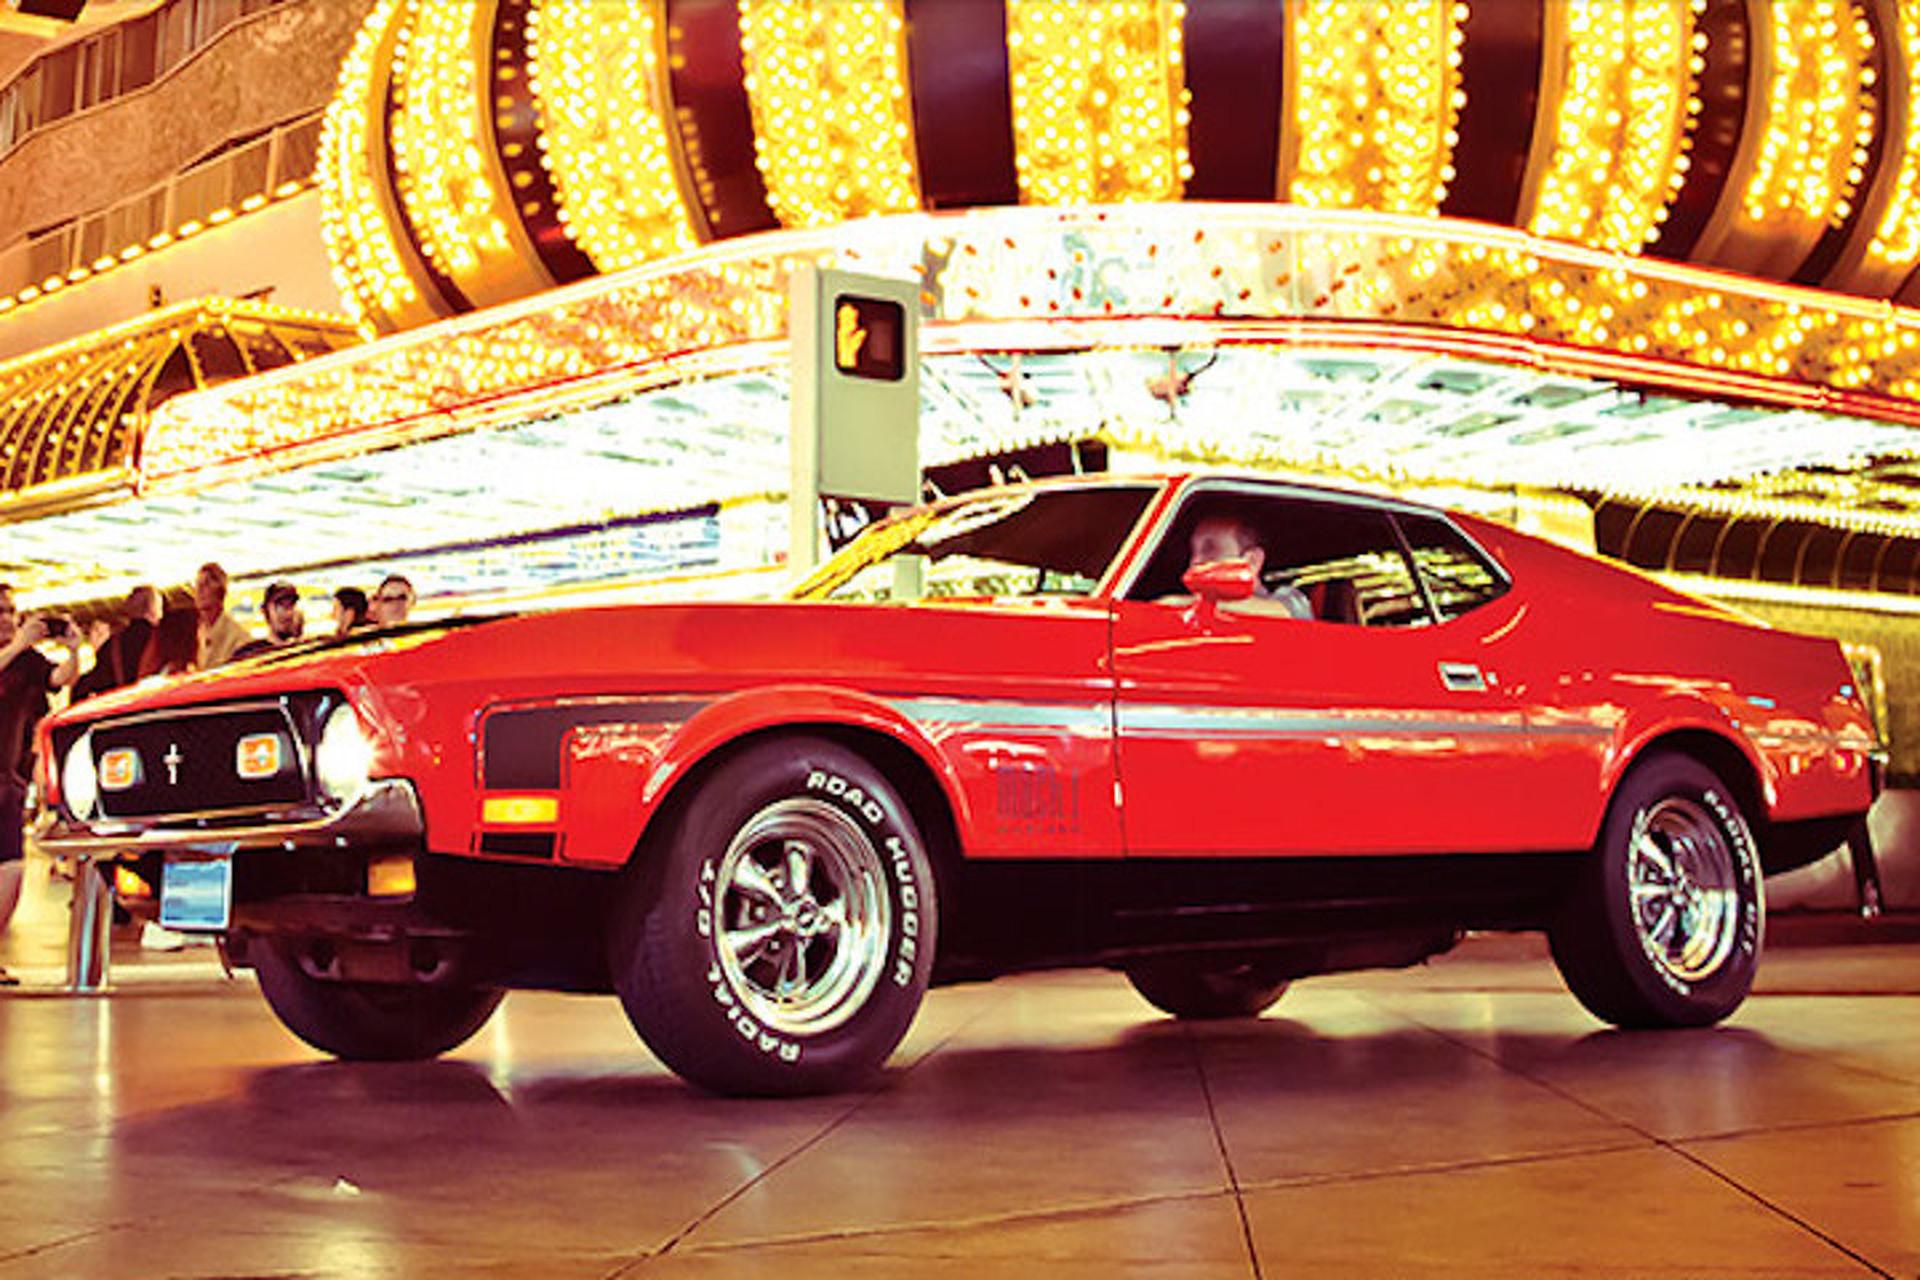 Remember When James Bond Drove A 1971 Mustang Mach 1?